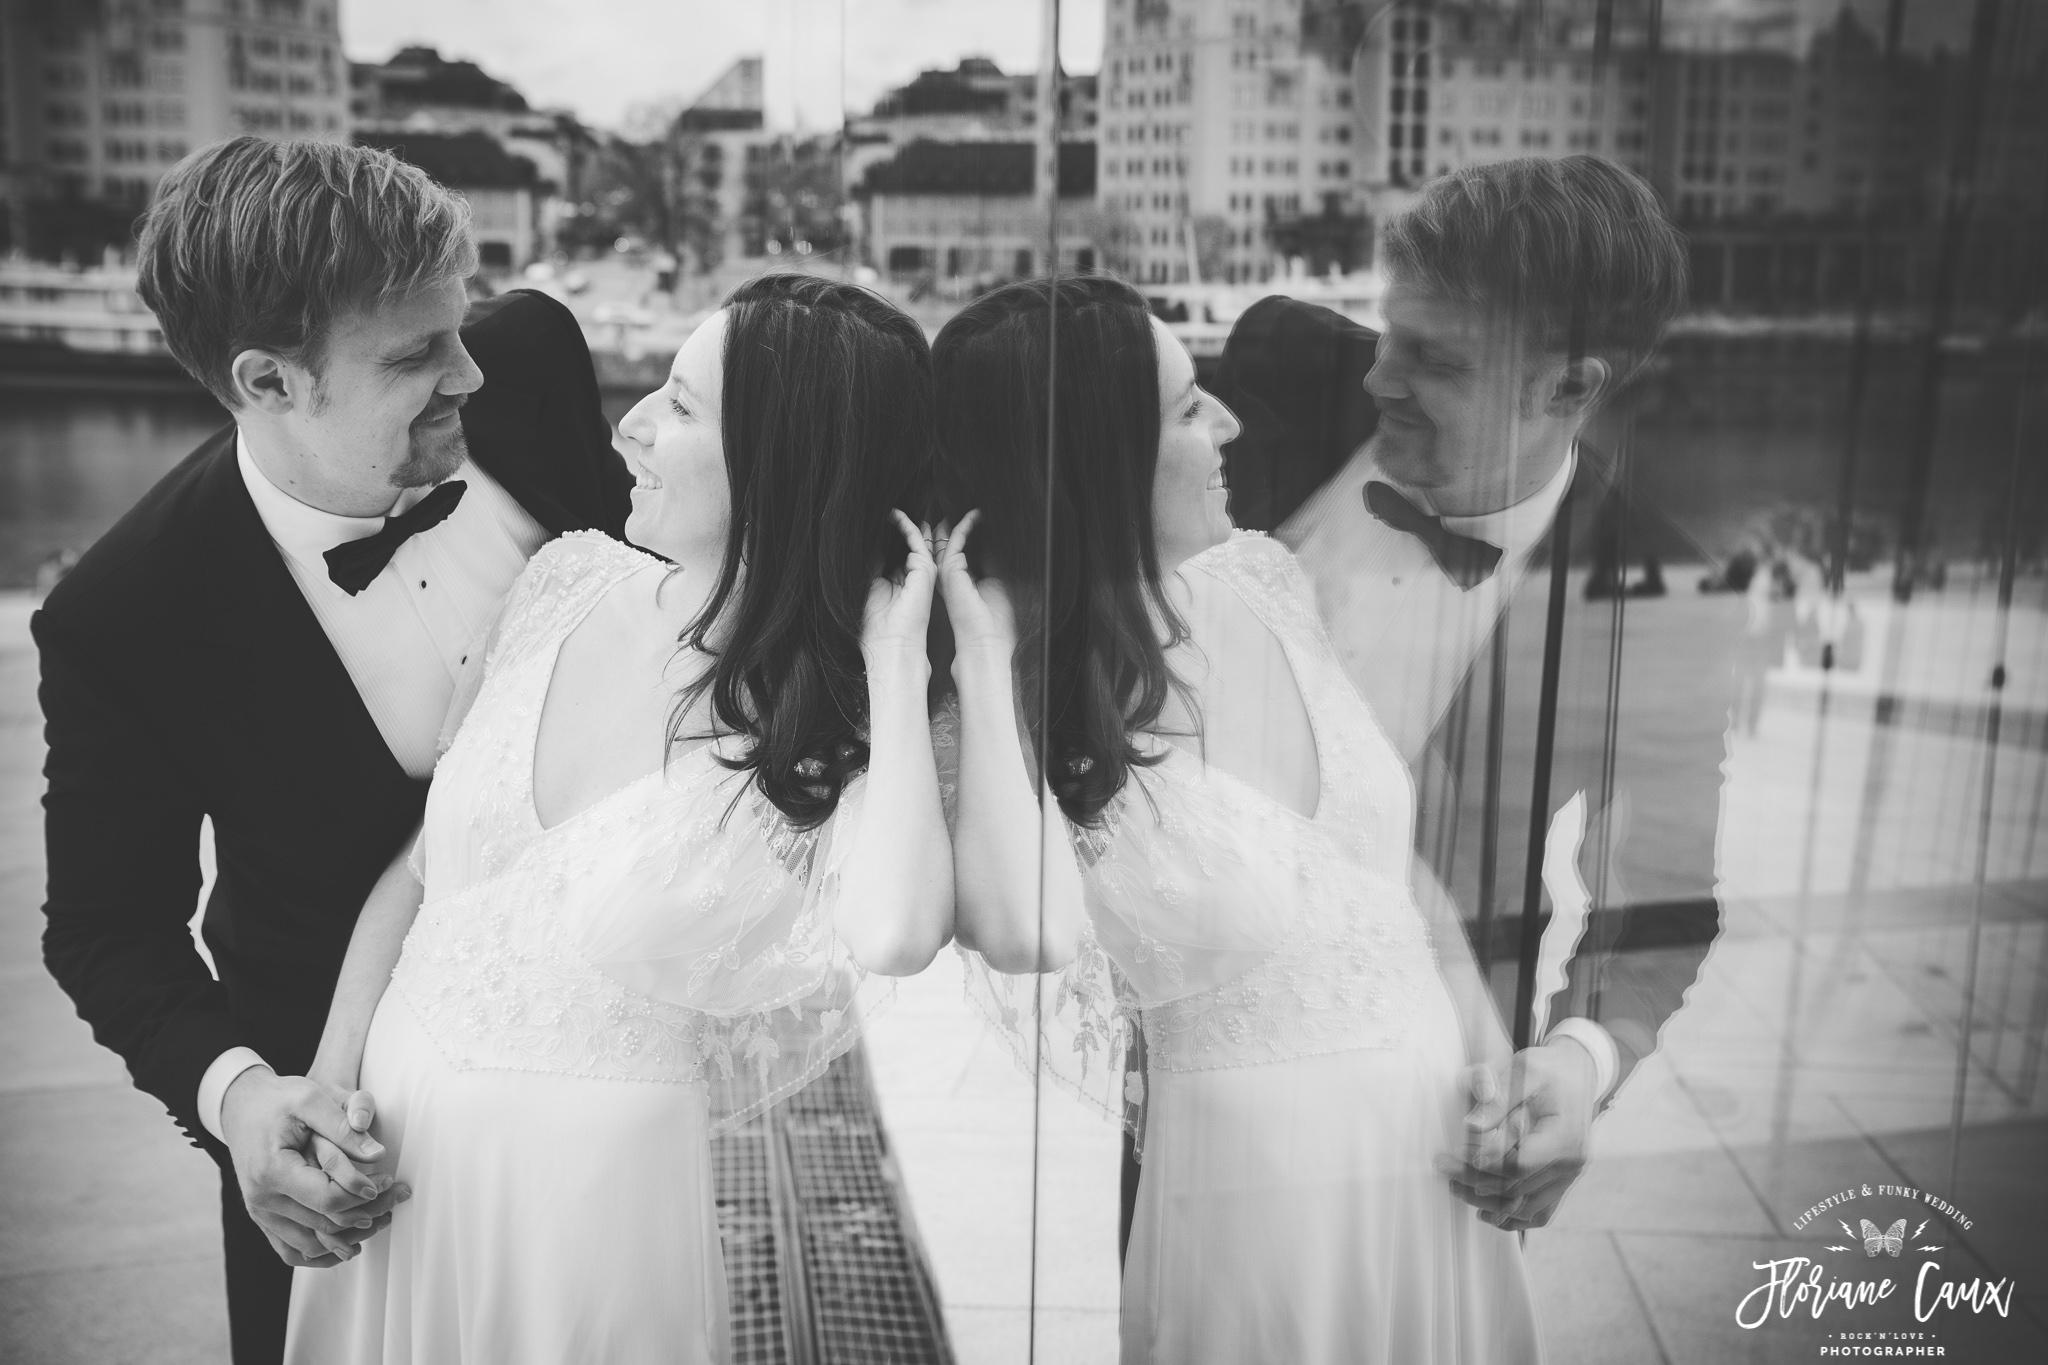 destination-wedding-photographer-oslo-norway-floriane-caux-66